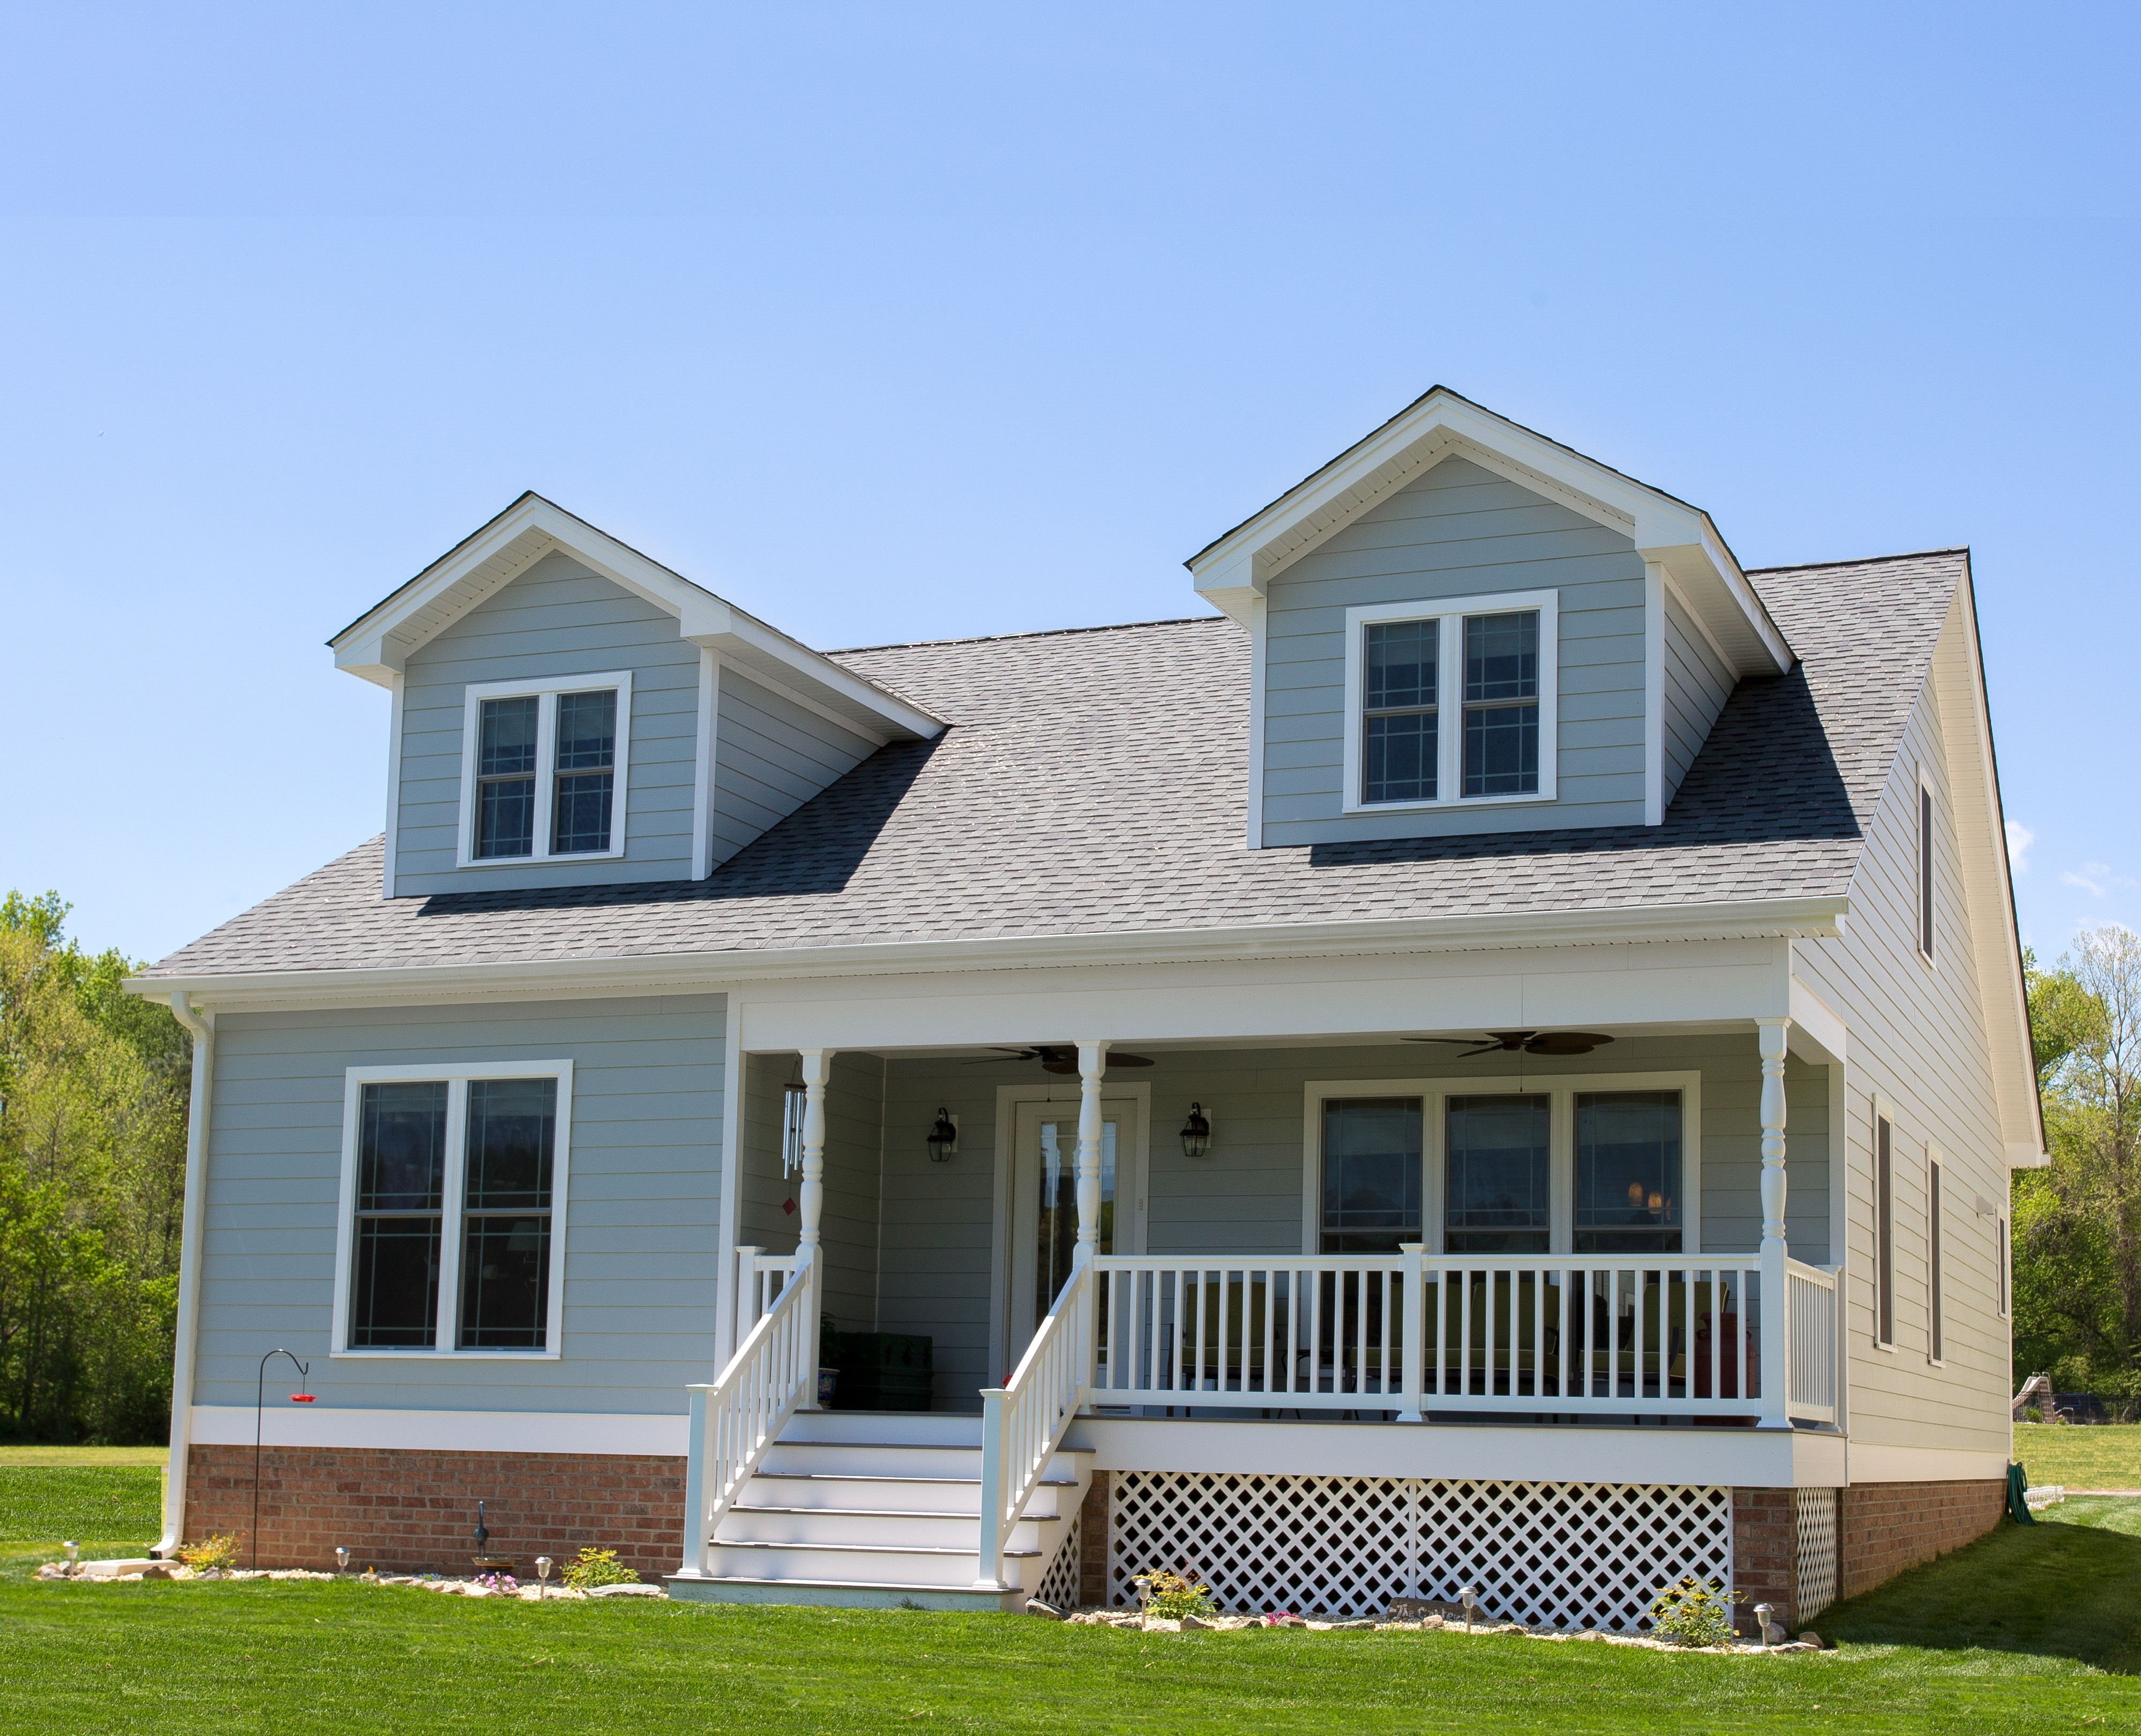 Northern_Neck_Virginia_Homes